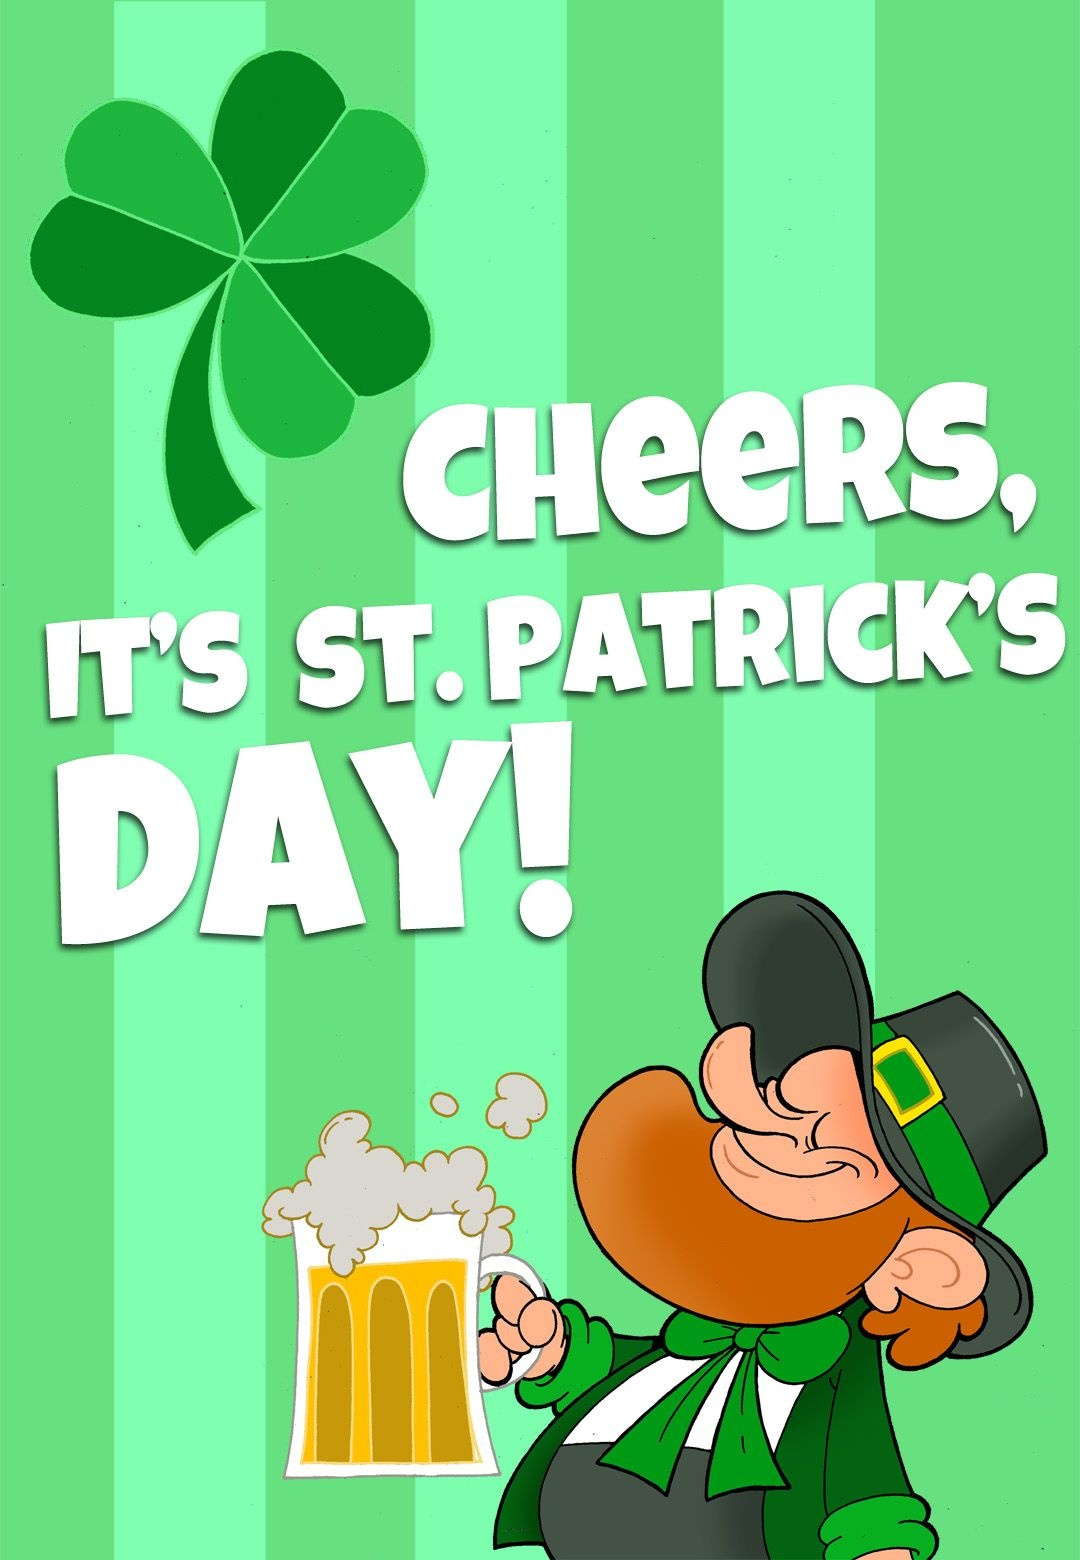 Free Printable 'its St Patricks Day' Greeting Card   Printable St - Free Printable St Patrick's Day Card